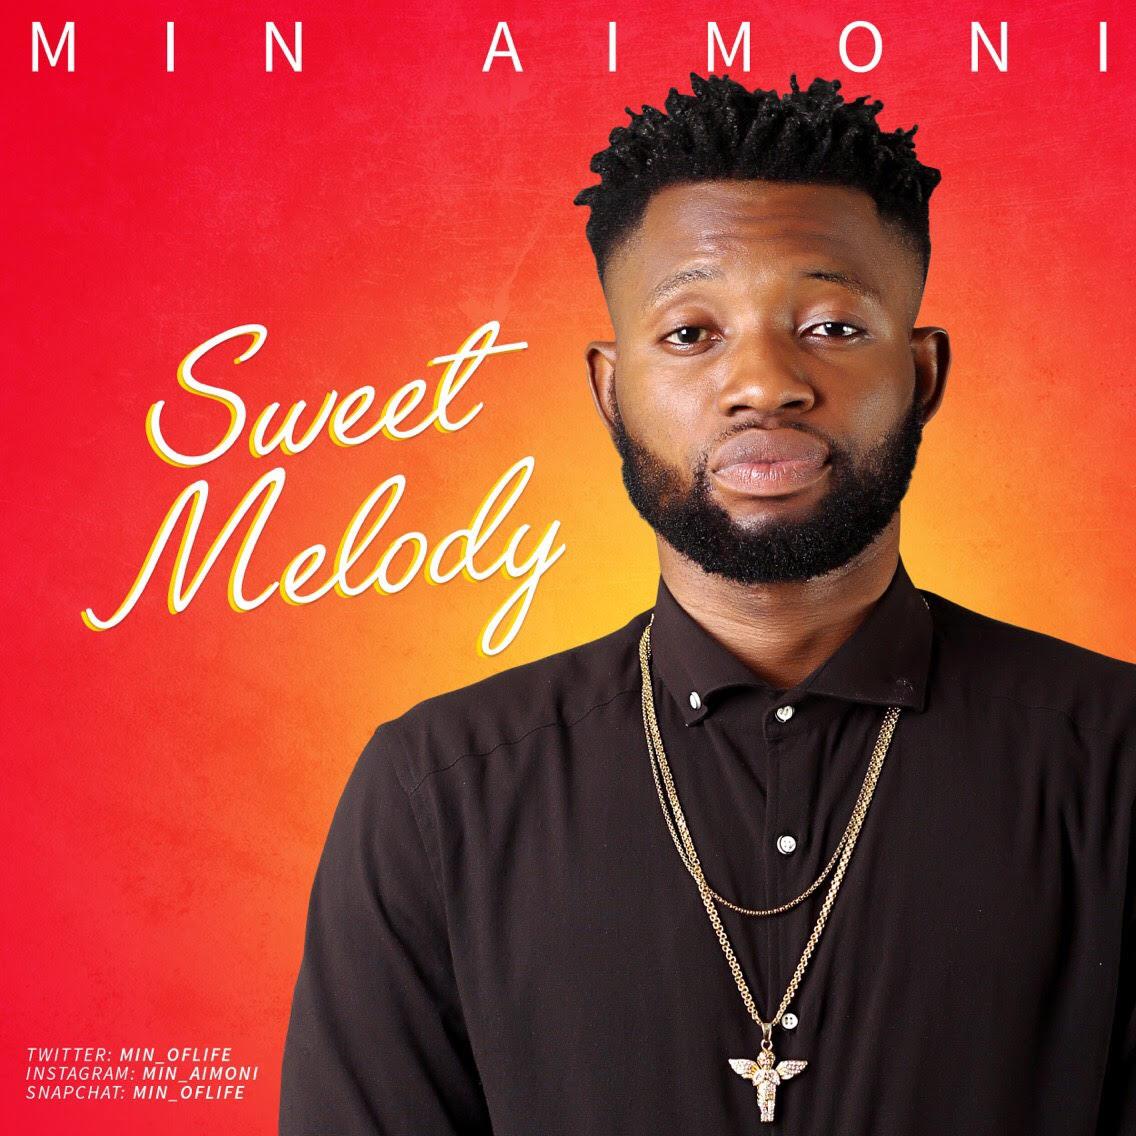 MIN Aimoni - Sweet Melody